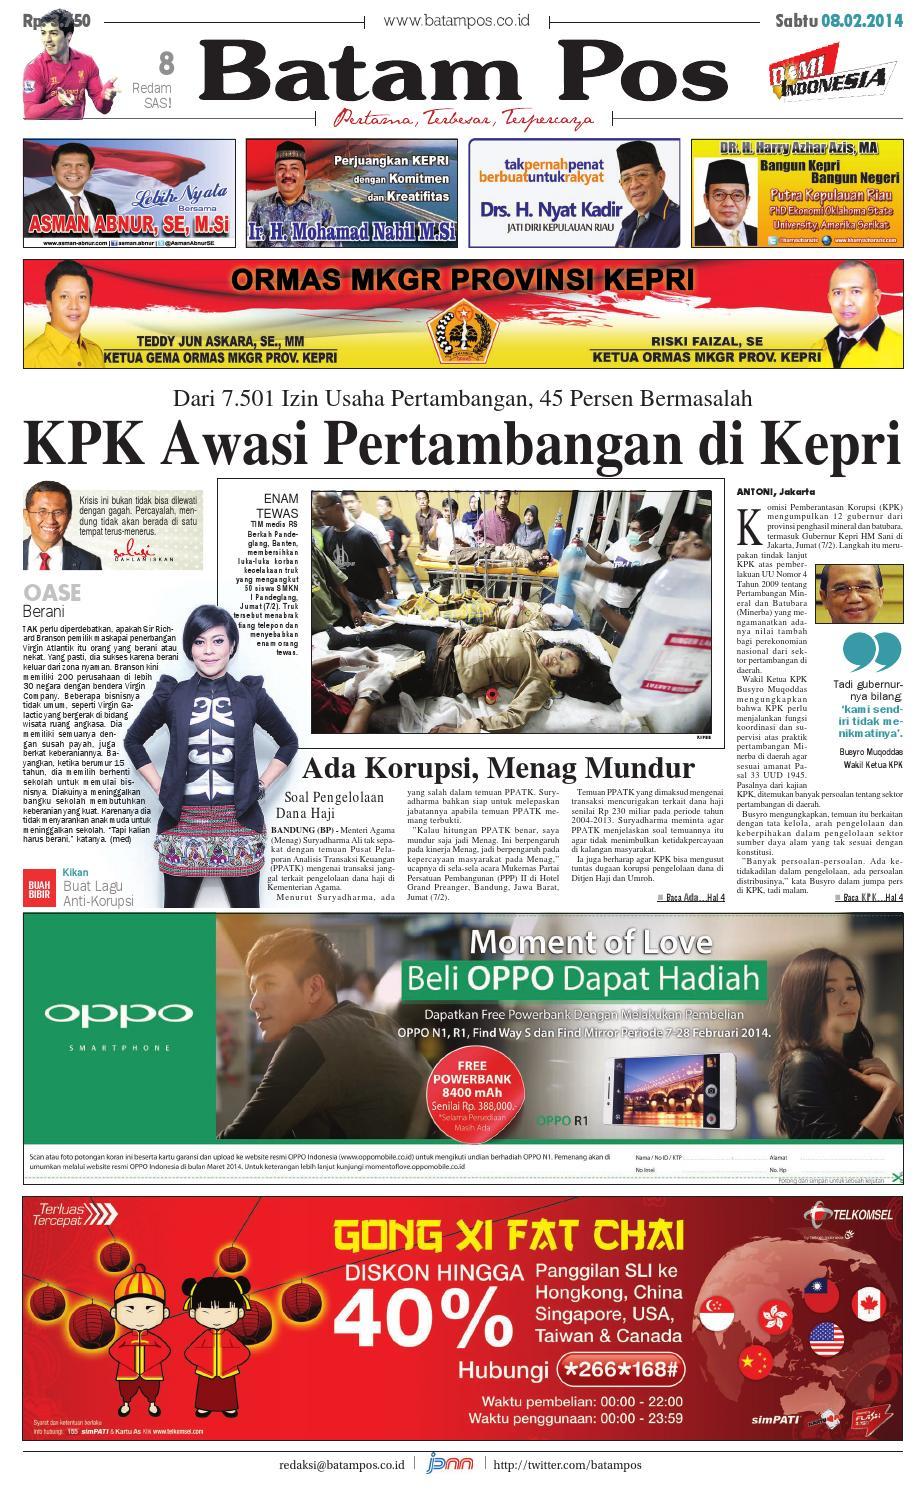 23 November 2013 By Batampos Newspaper Issuu Produk Ukm Paul Aksesories Id Card Leather Kartu Pengenal Kulit Warna Tan 8 Februari 2014